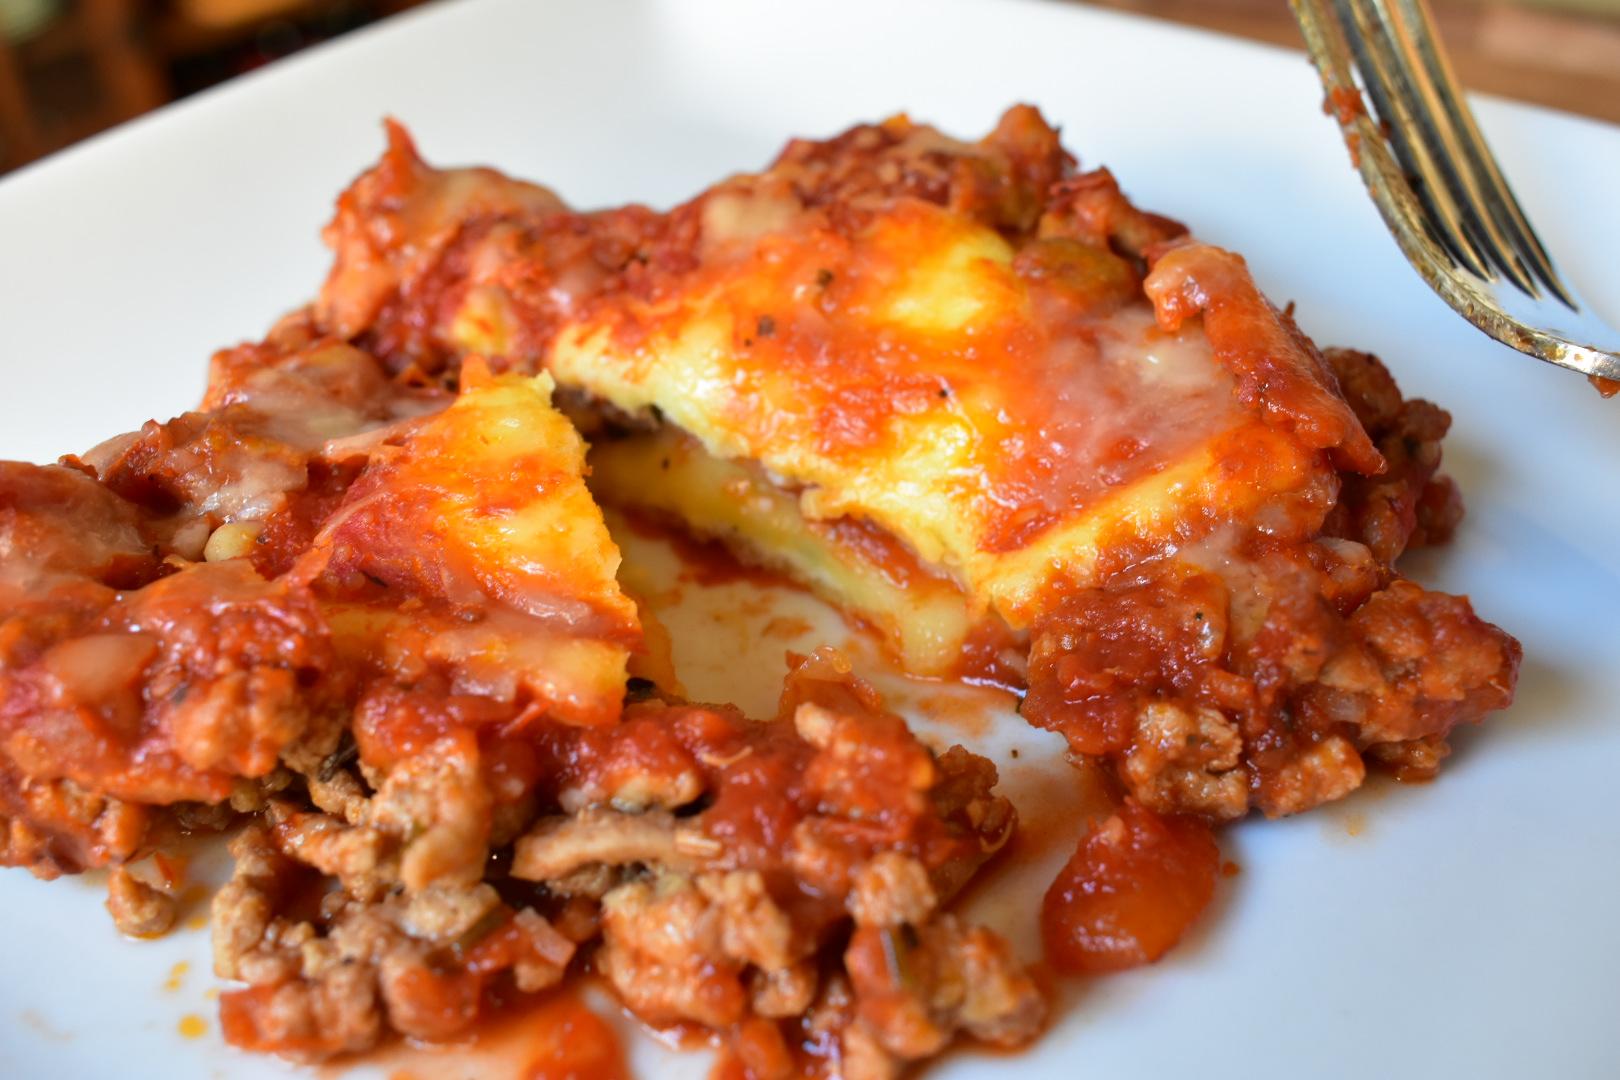 Turkey Ravioli Lasagna - Cooking Up Happiness